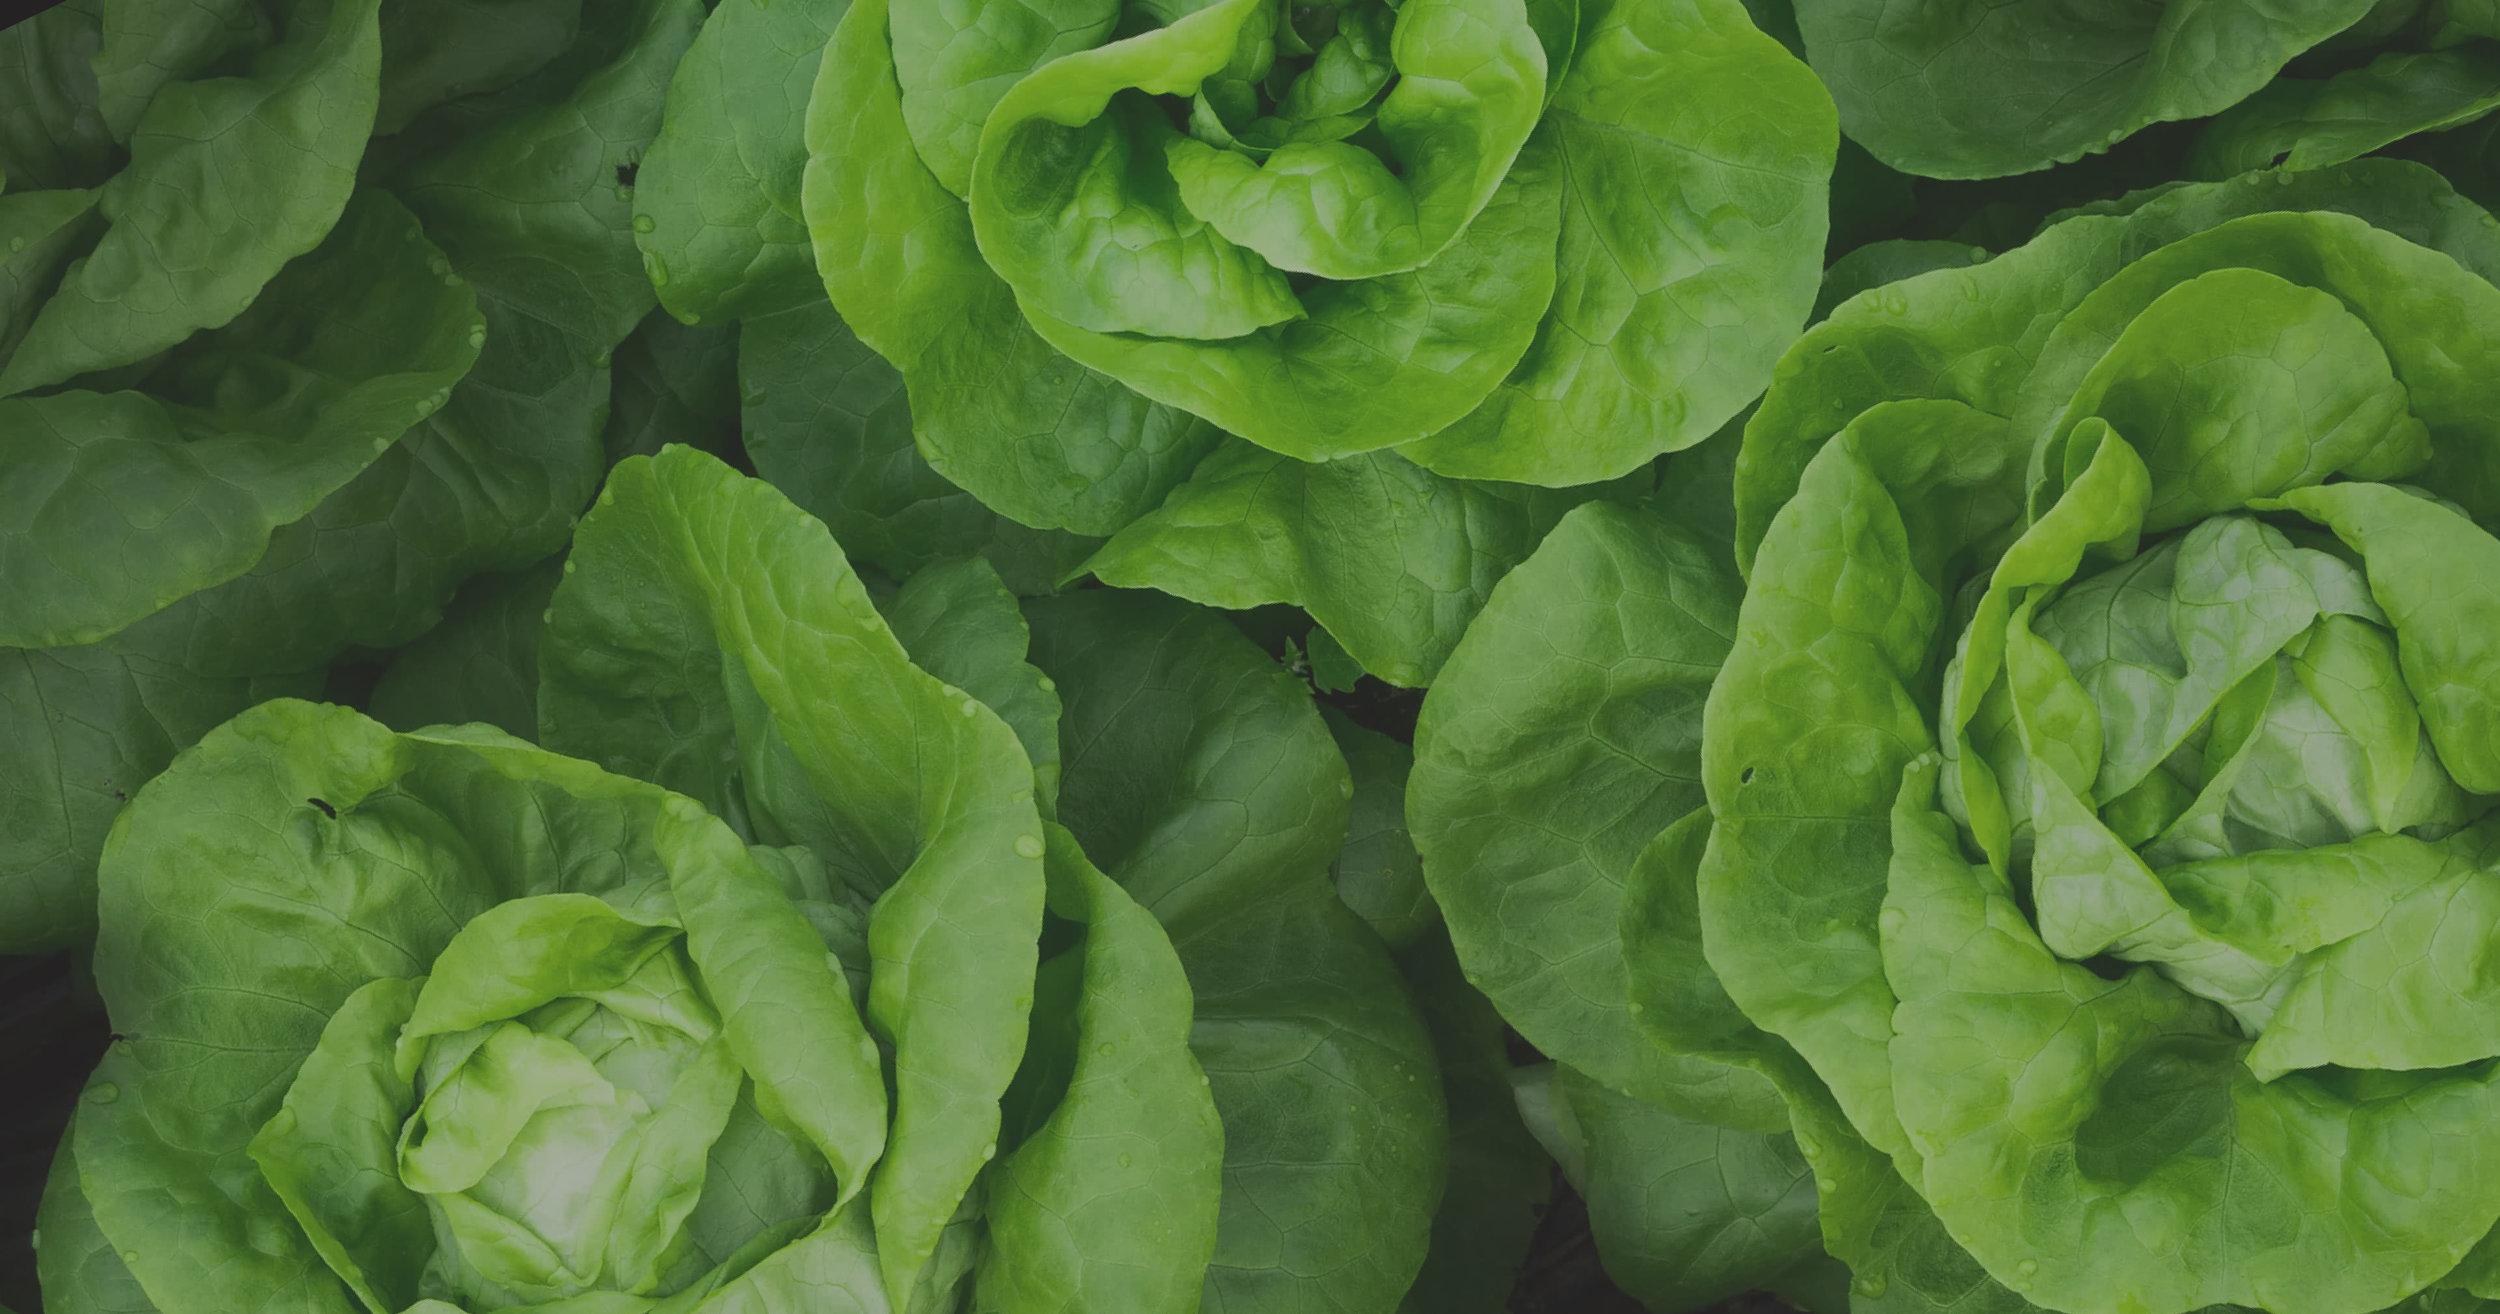 Full Harvest - Buy Imperfect, Process Grade & Surplus Produce — Full